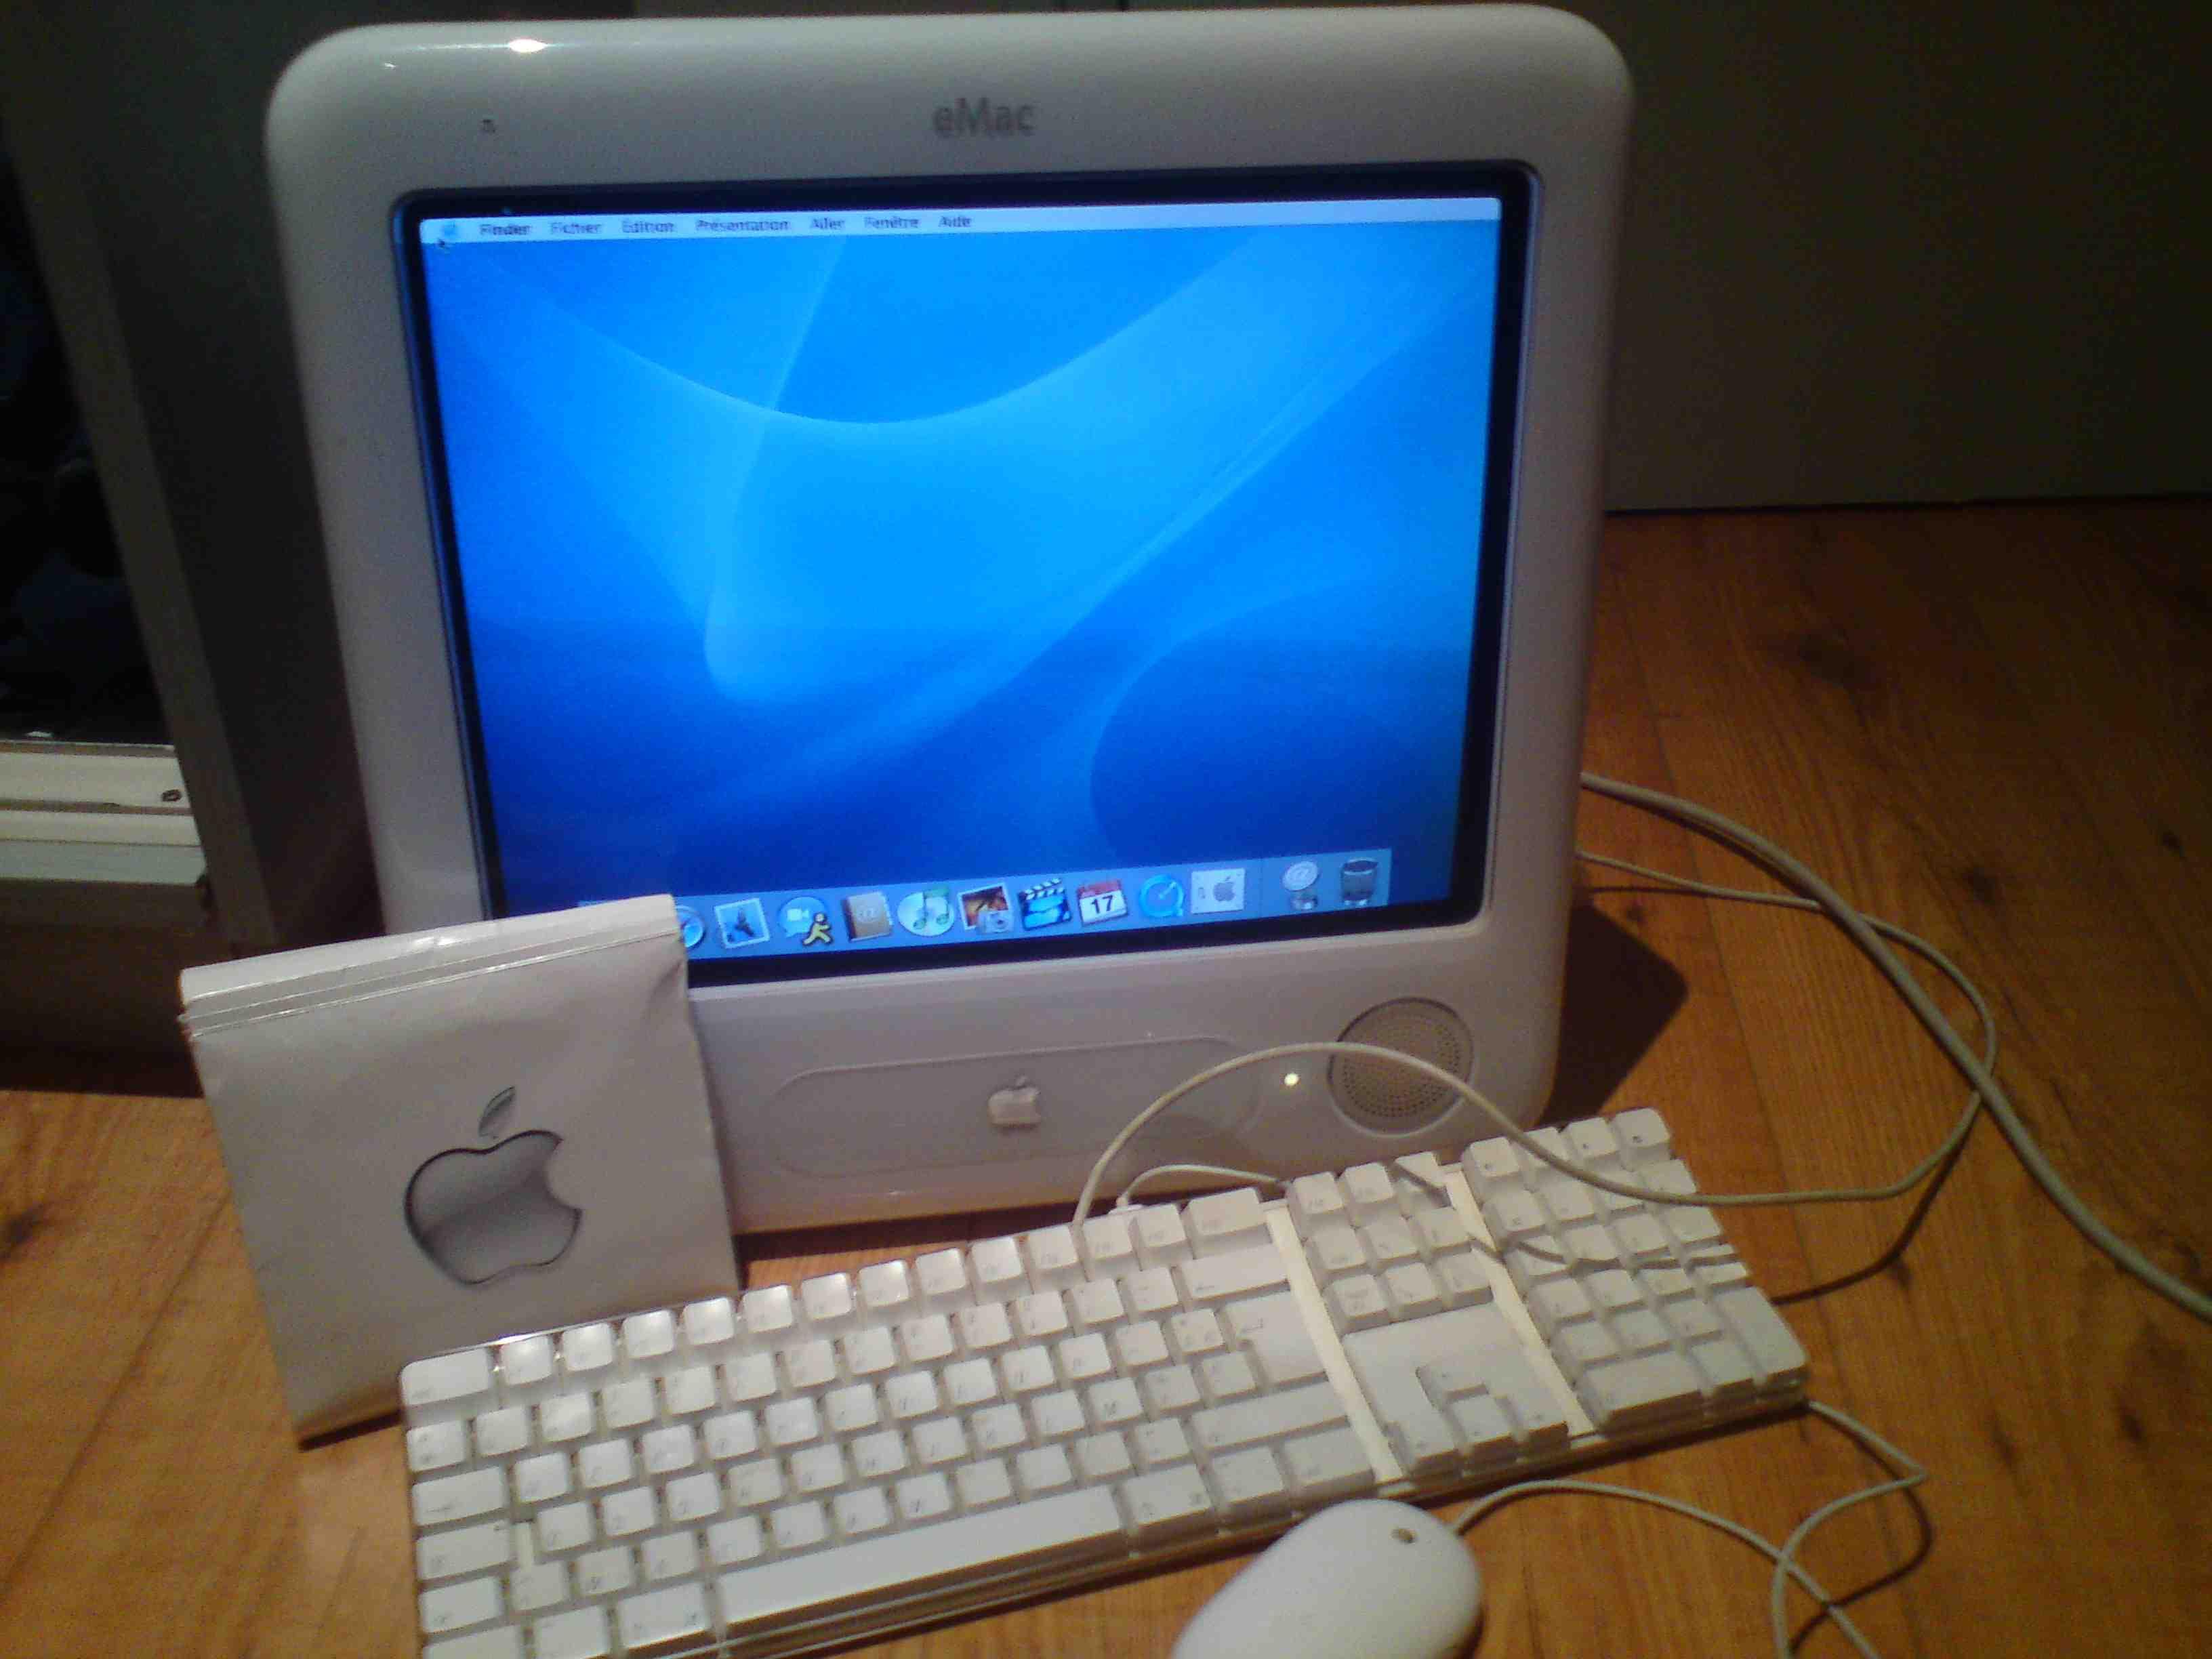 apple emac g4 1 ghz image 148716 audiofanzine rh en audiofanzine com apple imac manual guide apple imac manual guide